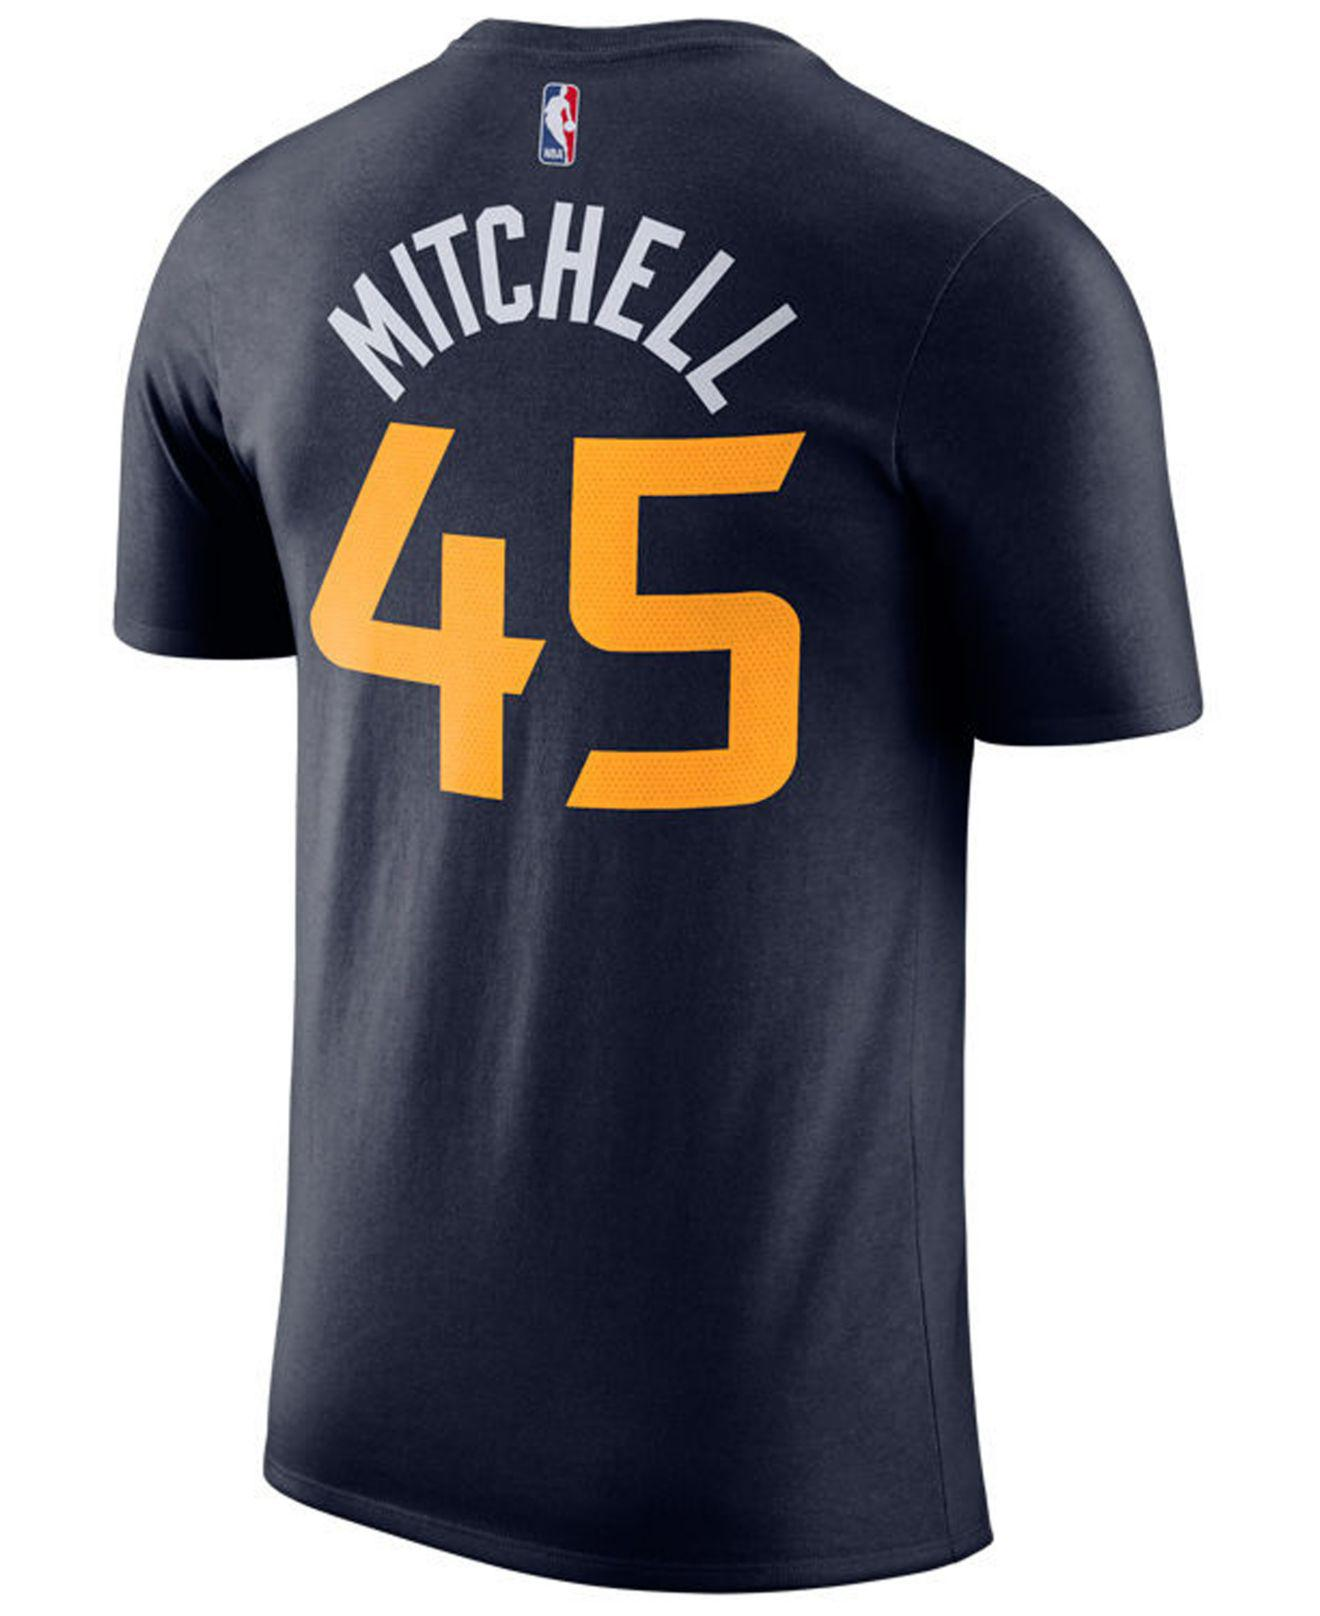 2b99aa326 Nike Donovan Mitchell Utah Jazz Icon Player T-shirt in Blue for Men ...